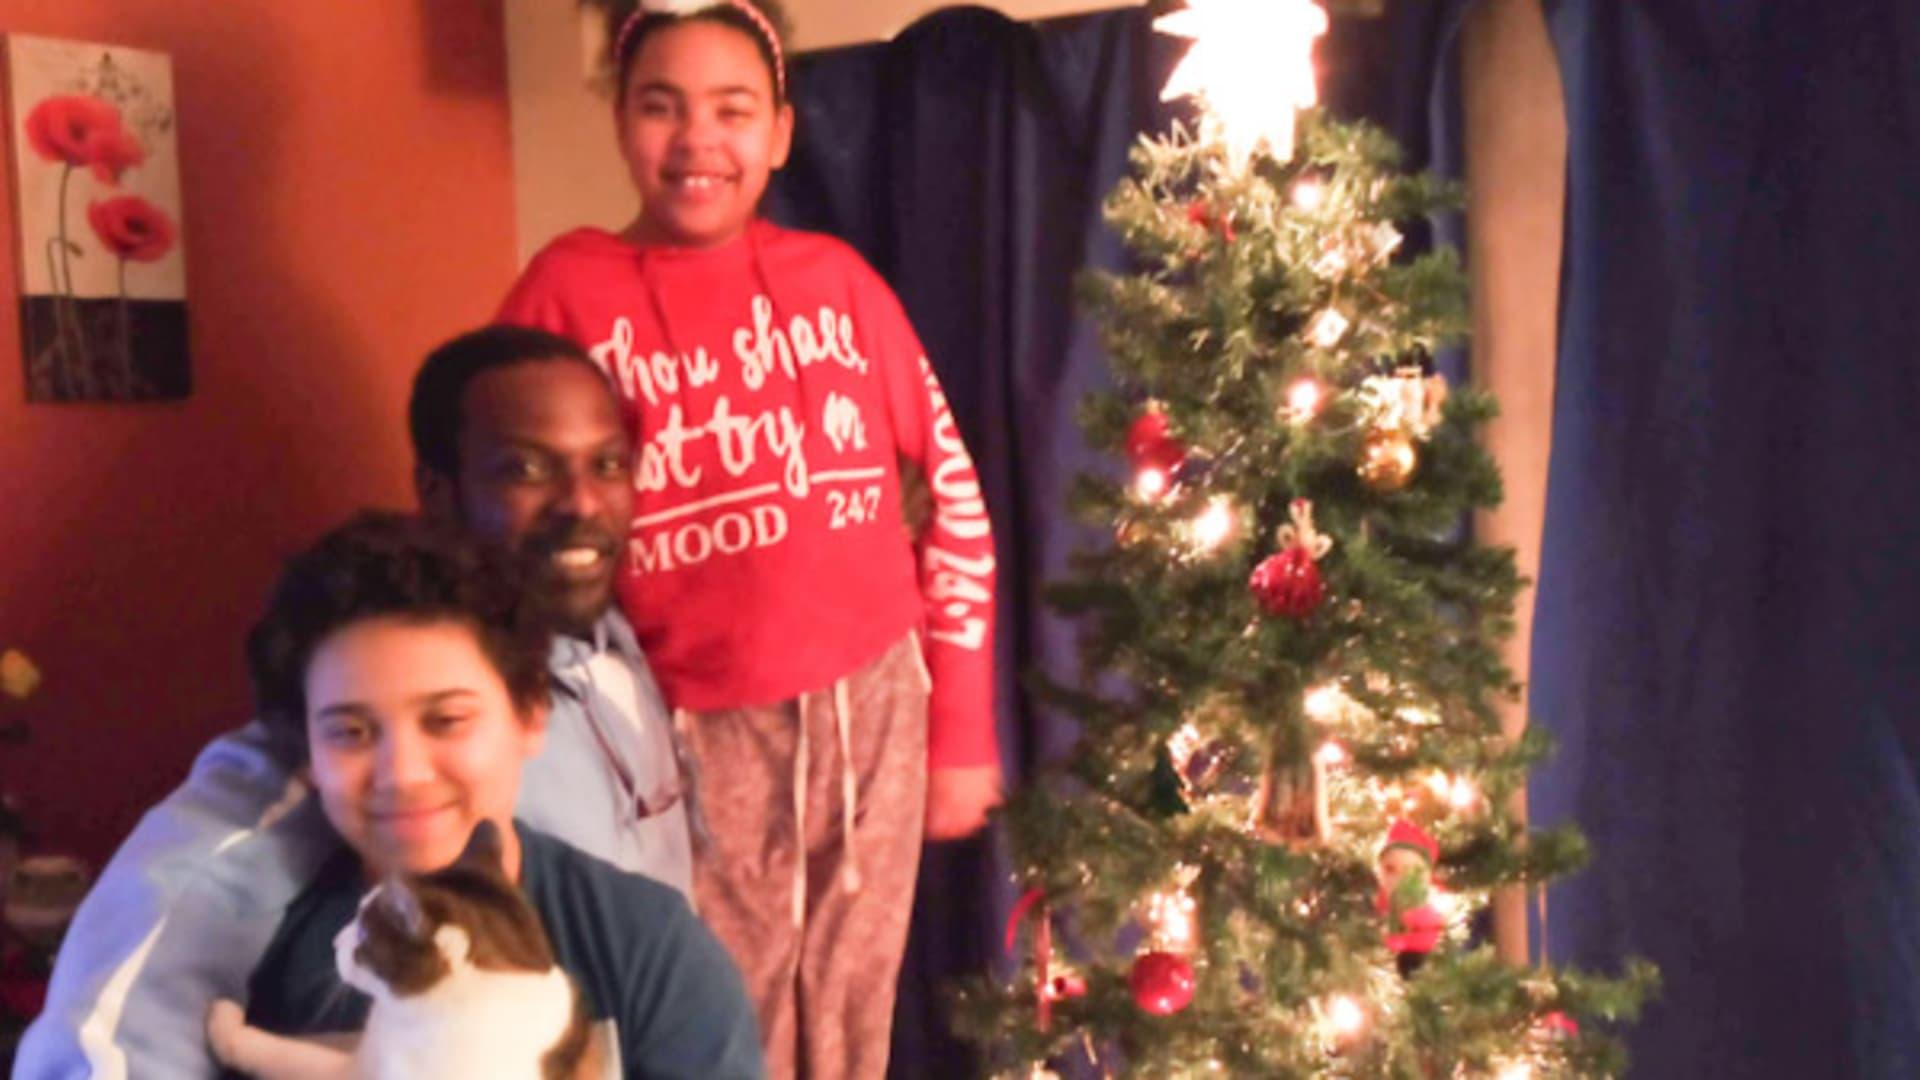 Ilene Toney's children, Izzac and Lillyana, and her fiance, Gerald Bright.